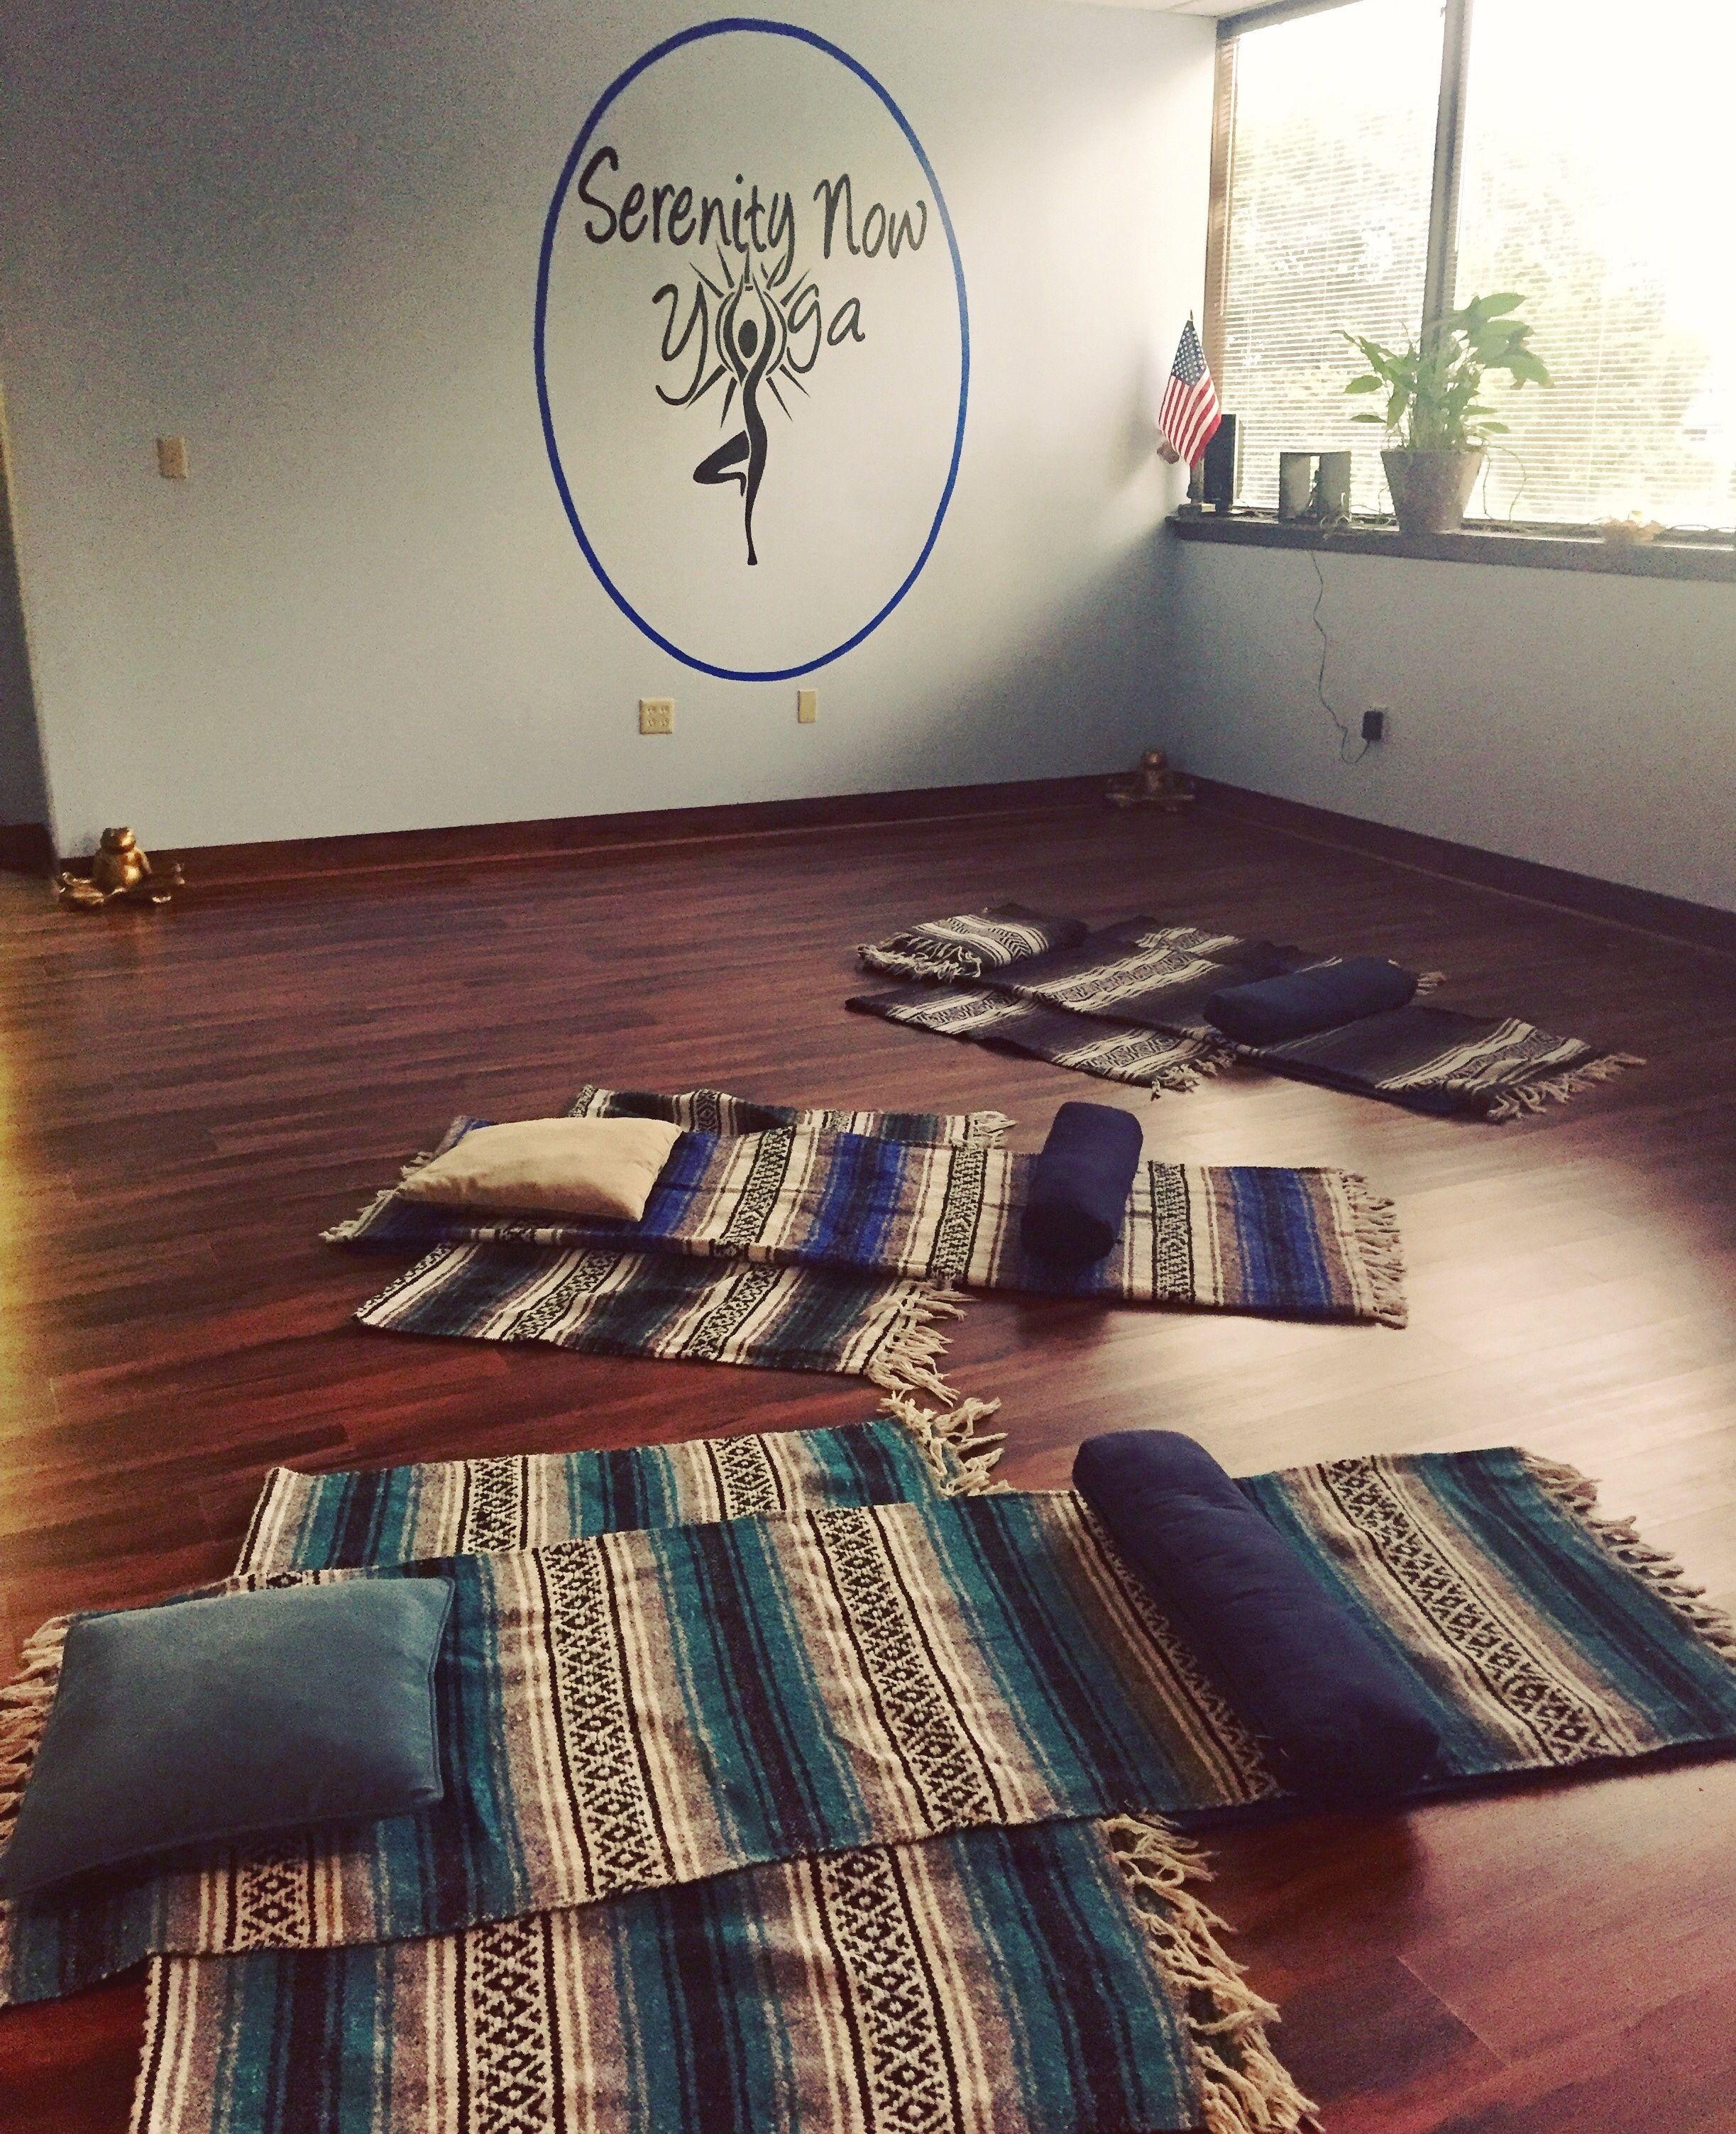 Photos - Orlando Yoga, Meditation and Energy Healing Meetup